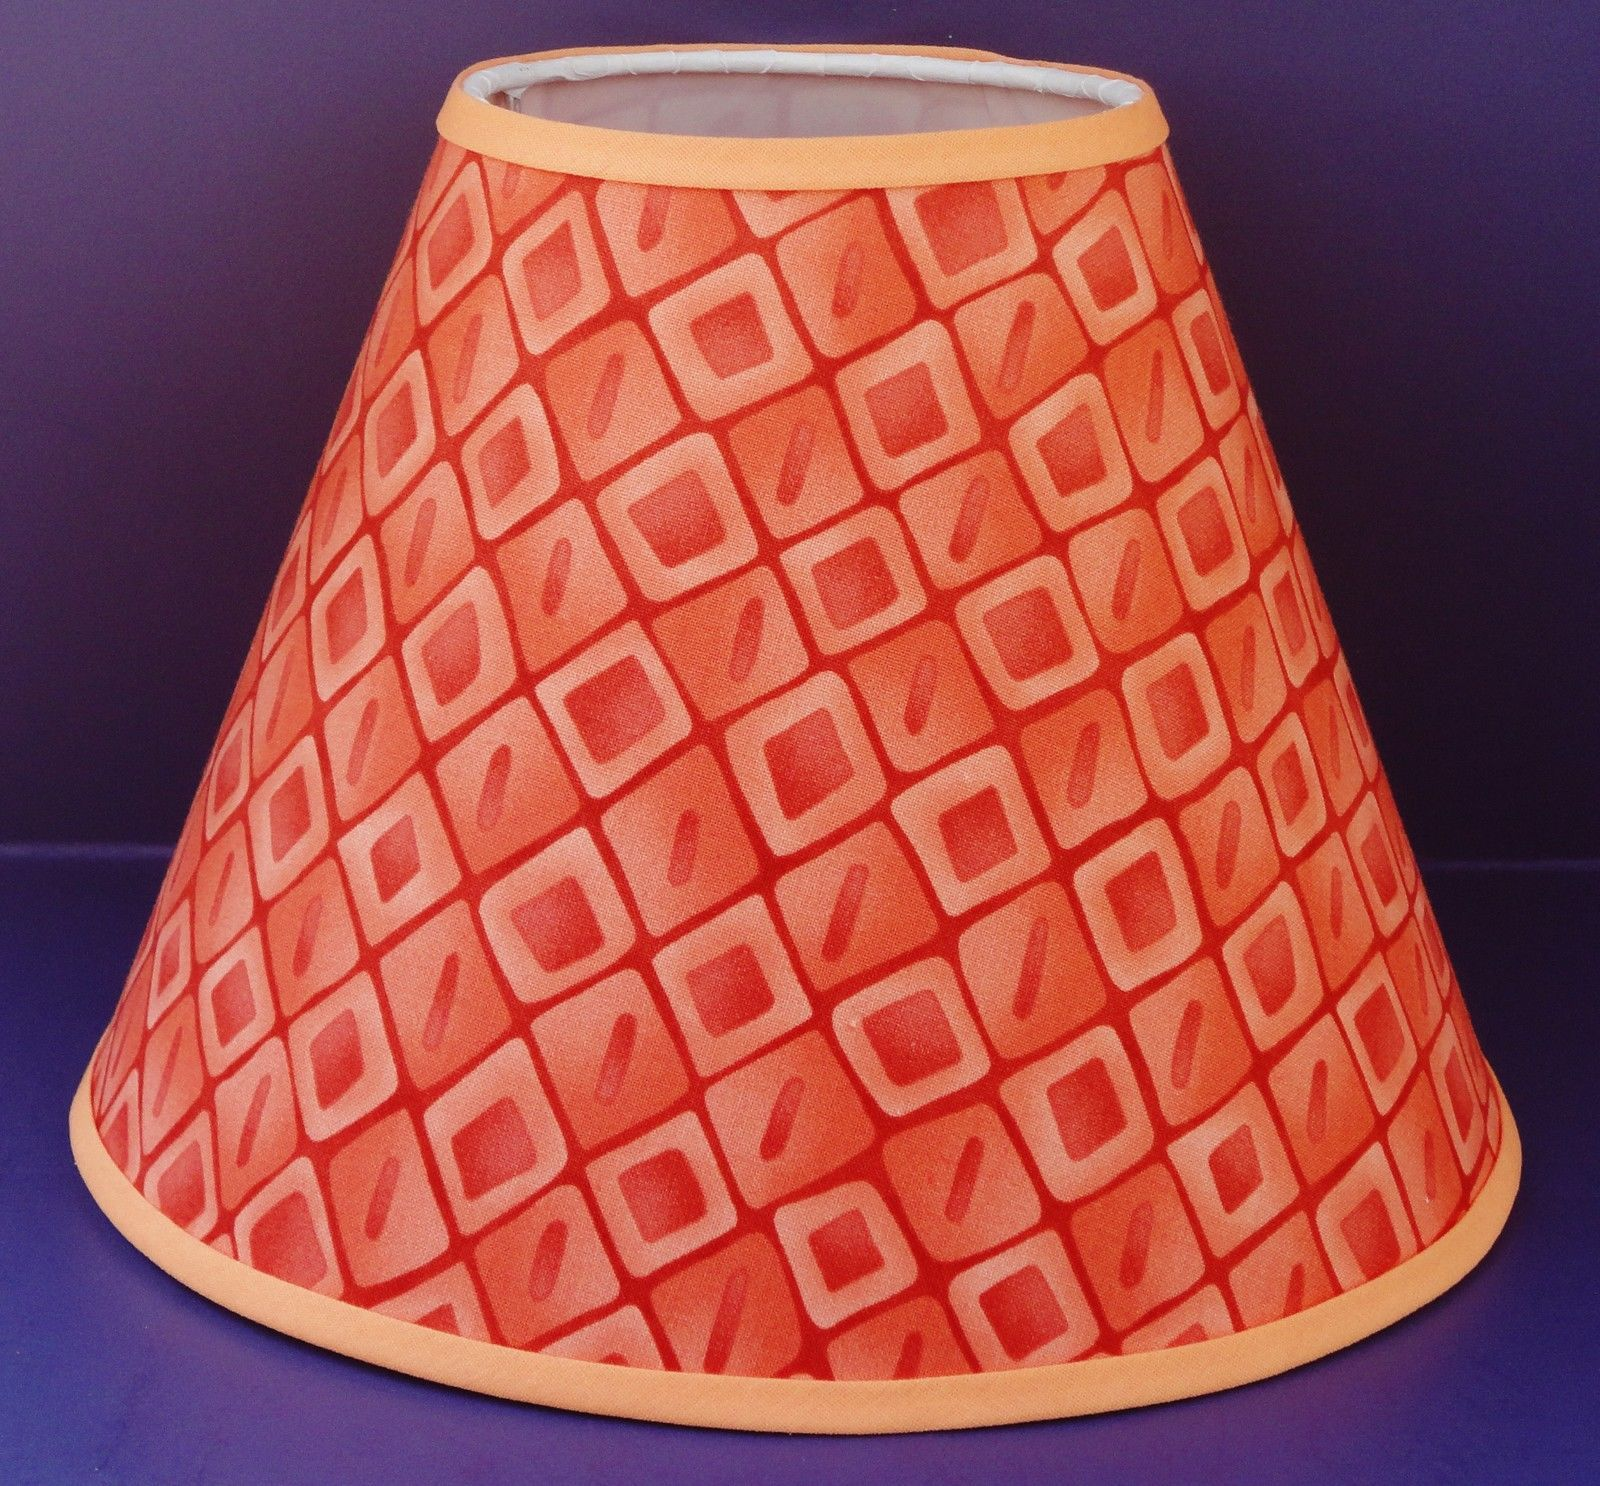 Lamp: Massive Lighting Metal Hanging Pendant Lampshade Light Orange And  Black from The Orange Lamp